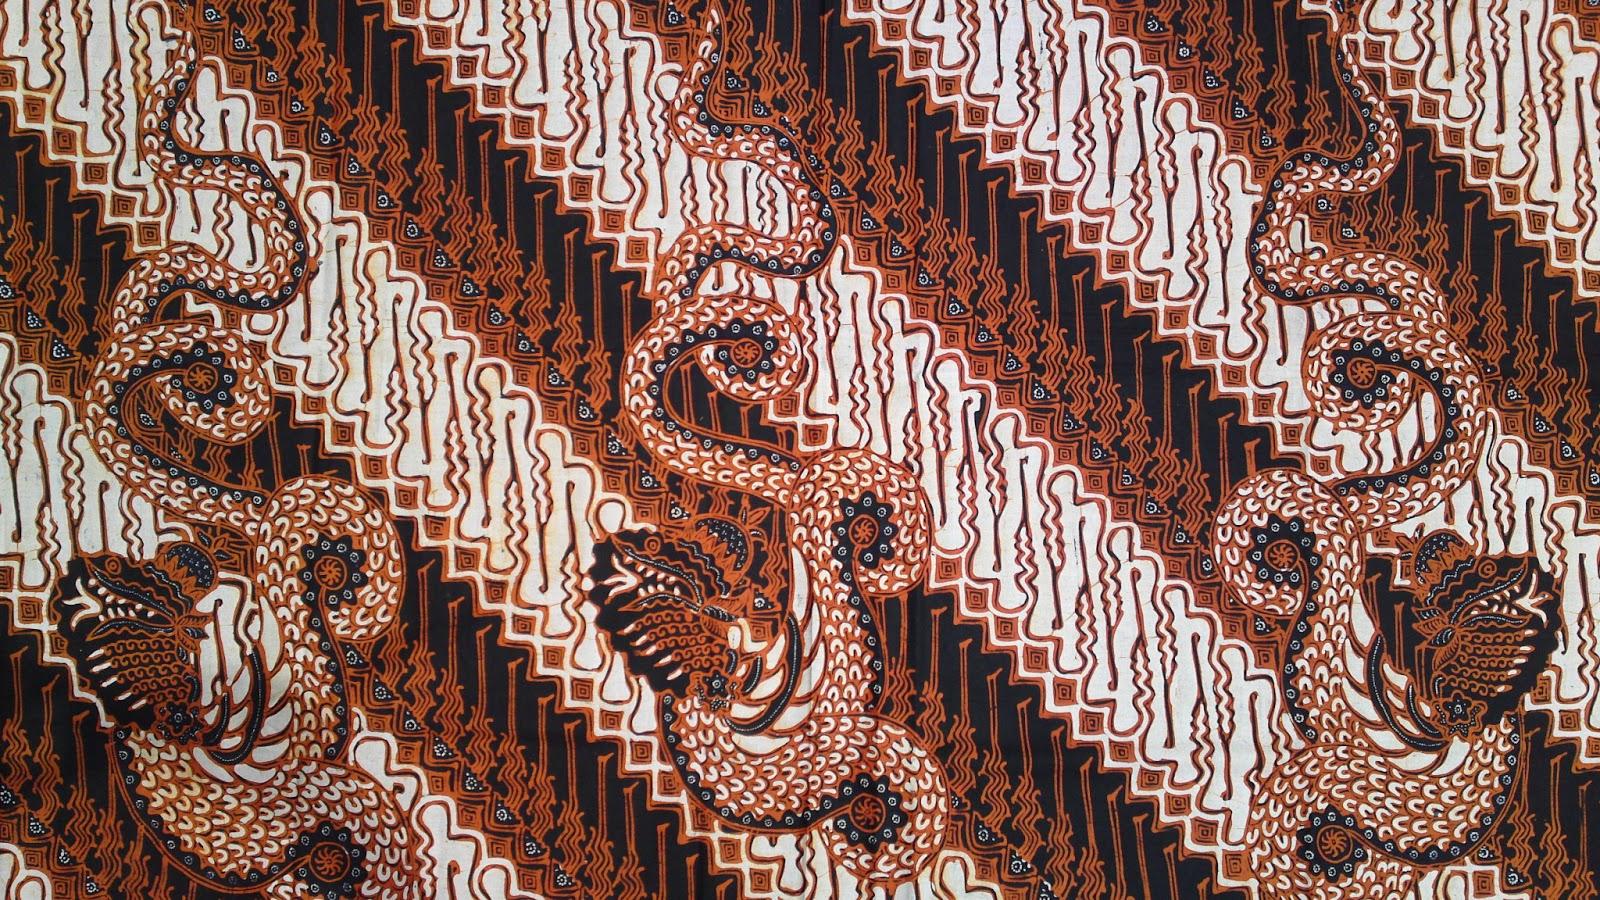 Sejarah Batik-Asal Usul Batik